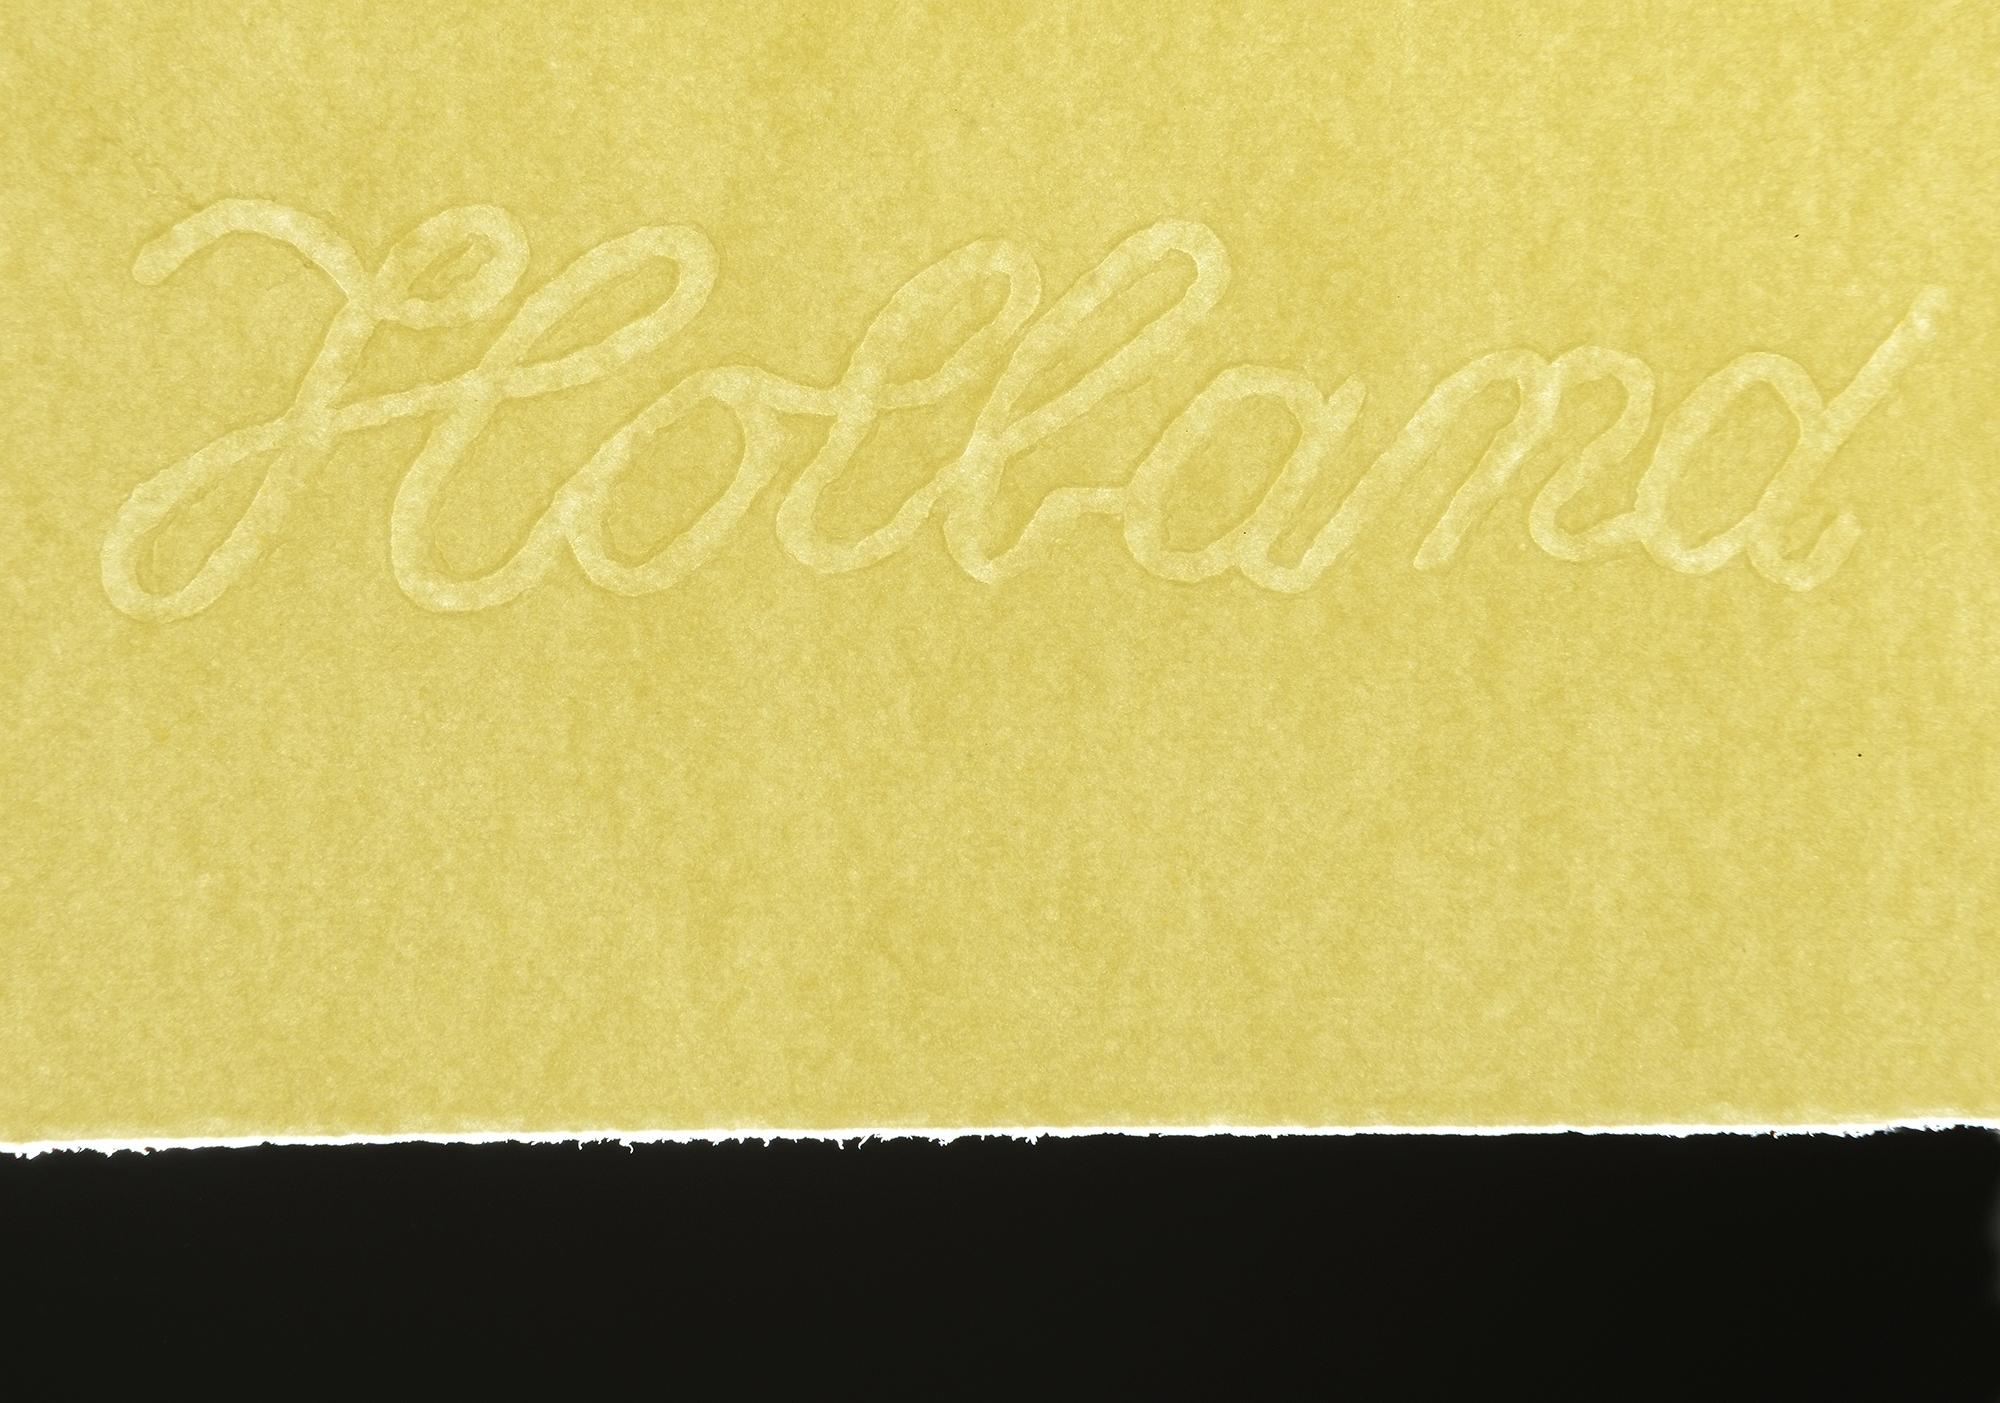 art paper watermark Find great deals on ebay for paper watermark and watermarked paper shop with confidence.